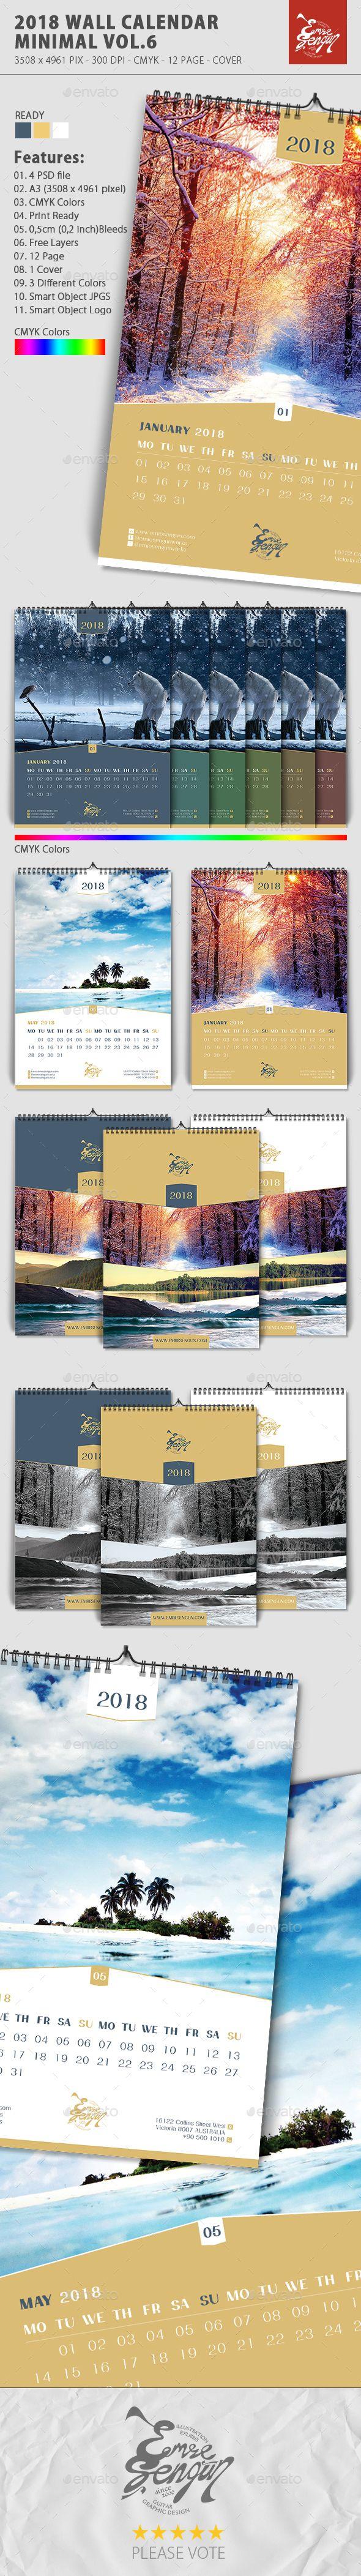 2018 wall calendar minimal vol6 minimal calendar design and font 2018 wall calendar minimal vol6 saigontimesfo